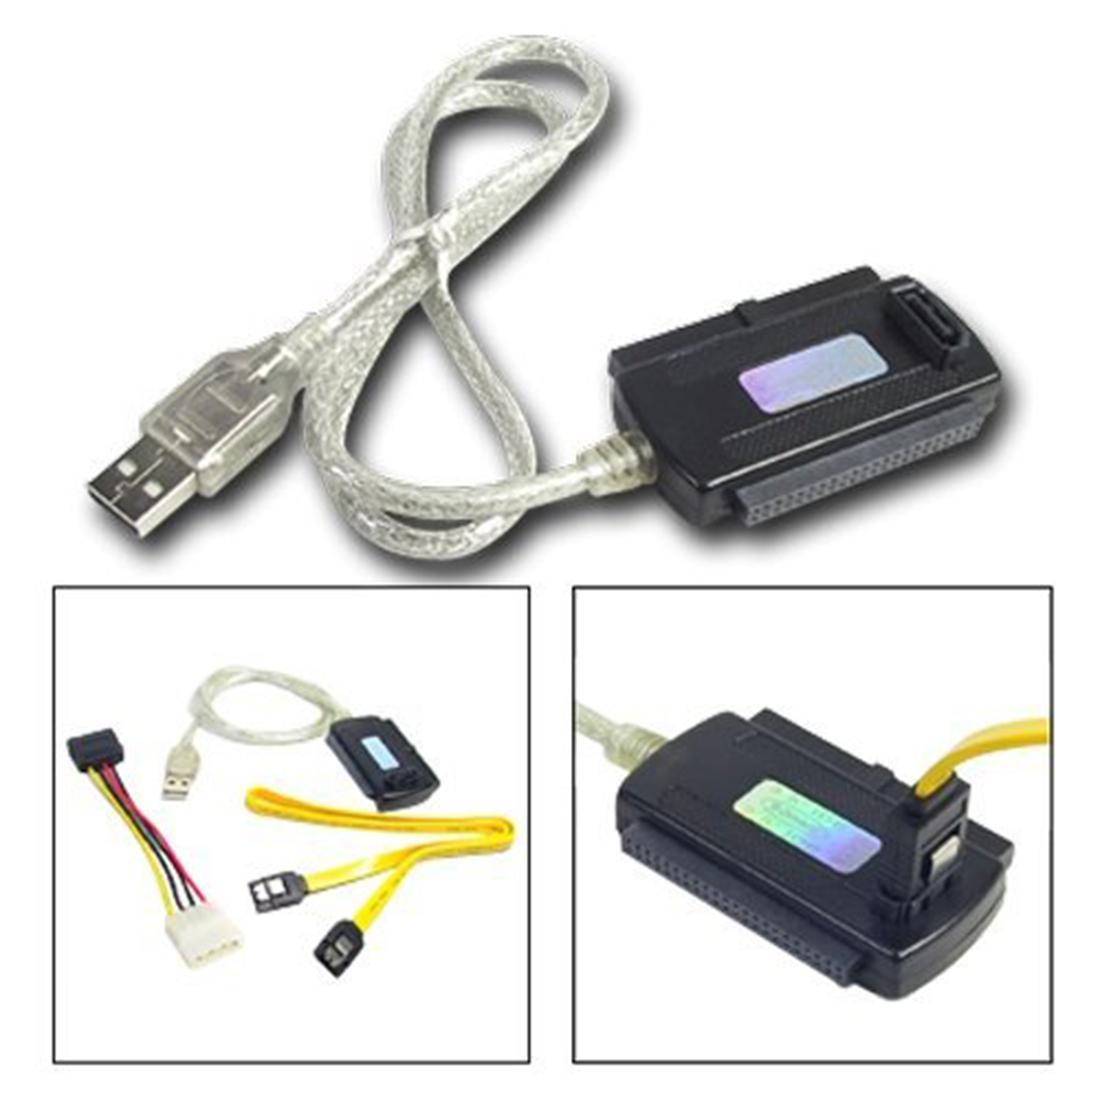 Marsnaska USB 2.0 to IDE SATA 5.25 S-ATA/2.5/3.5 Hard Drive HD HDD Adapter Cable Converter 480Mb/s Speed high quality high speed 3 5 ide to sata ide ata 100 133 hdd adapter converter adapter with sata cable power cable for mac pc